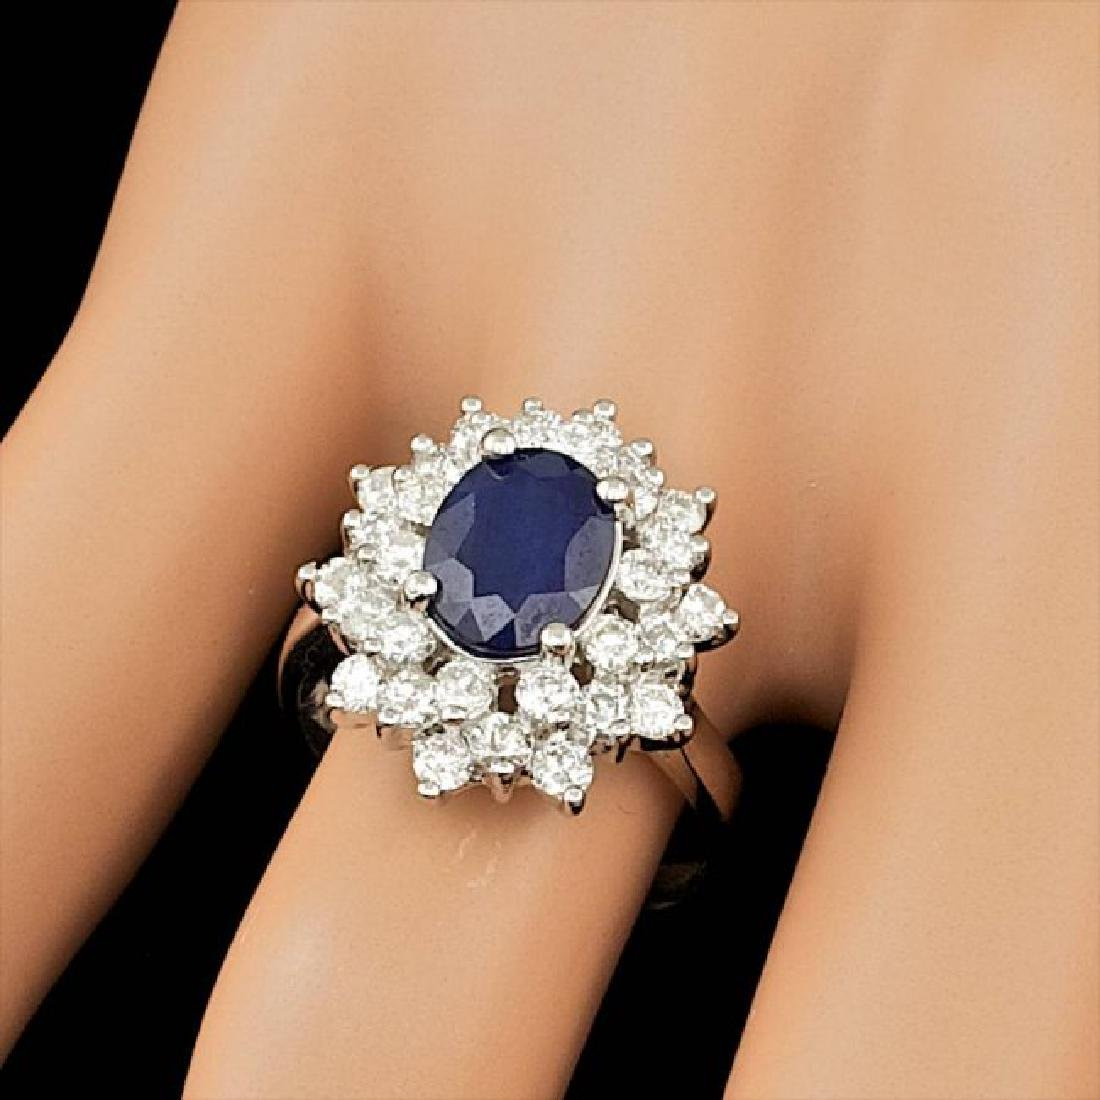 14k Gold 2.00ct Sapphire 1.45ct Diamond Ring - 4